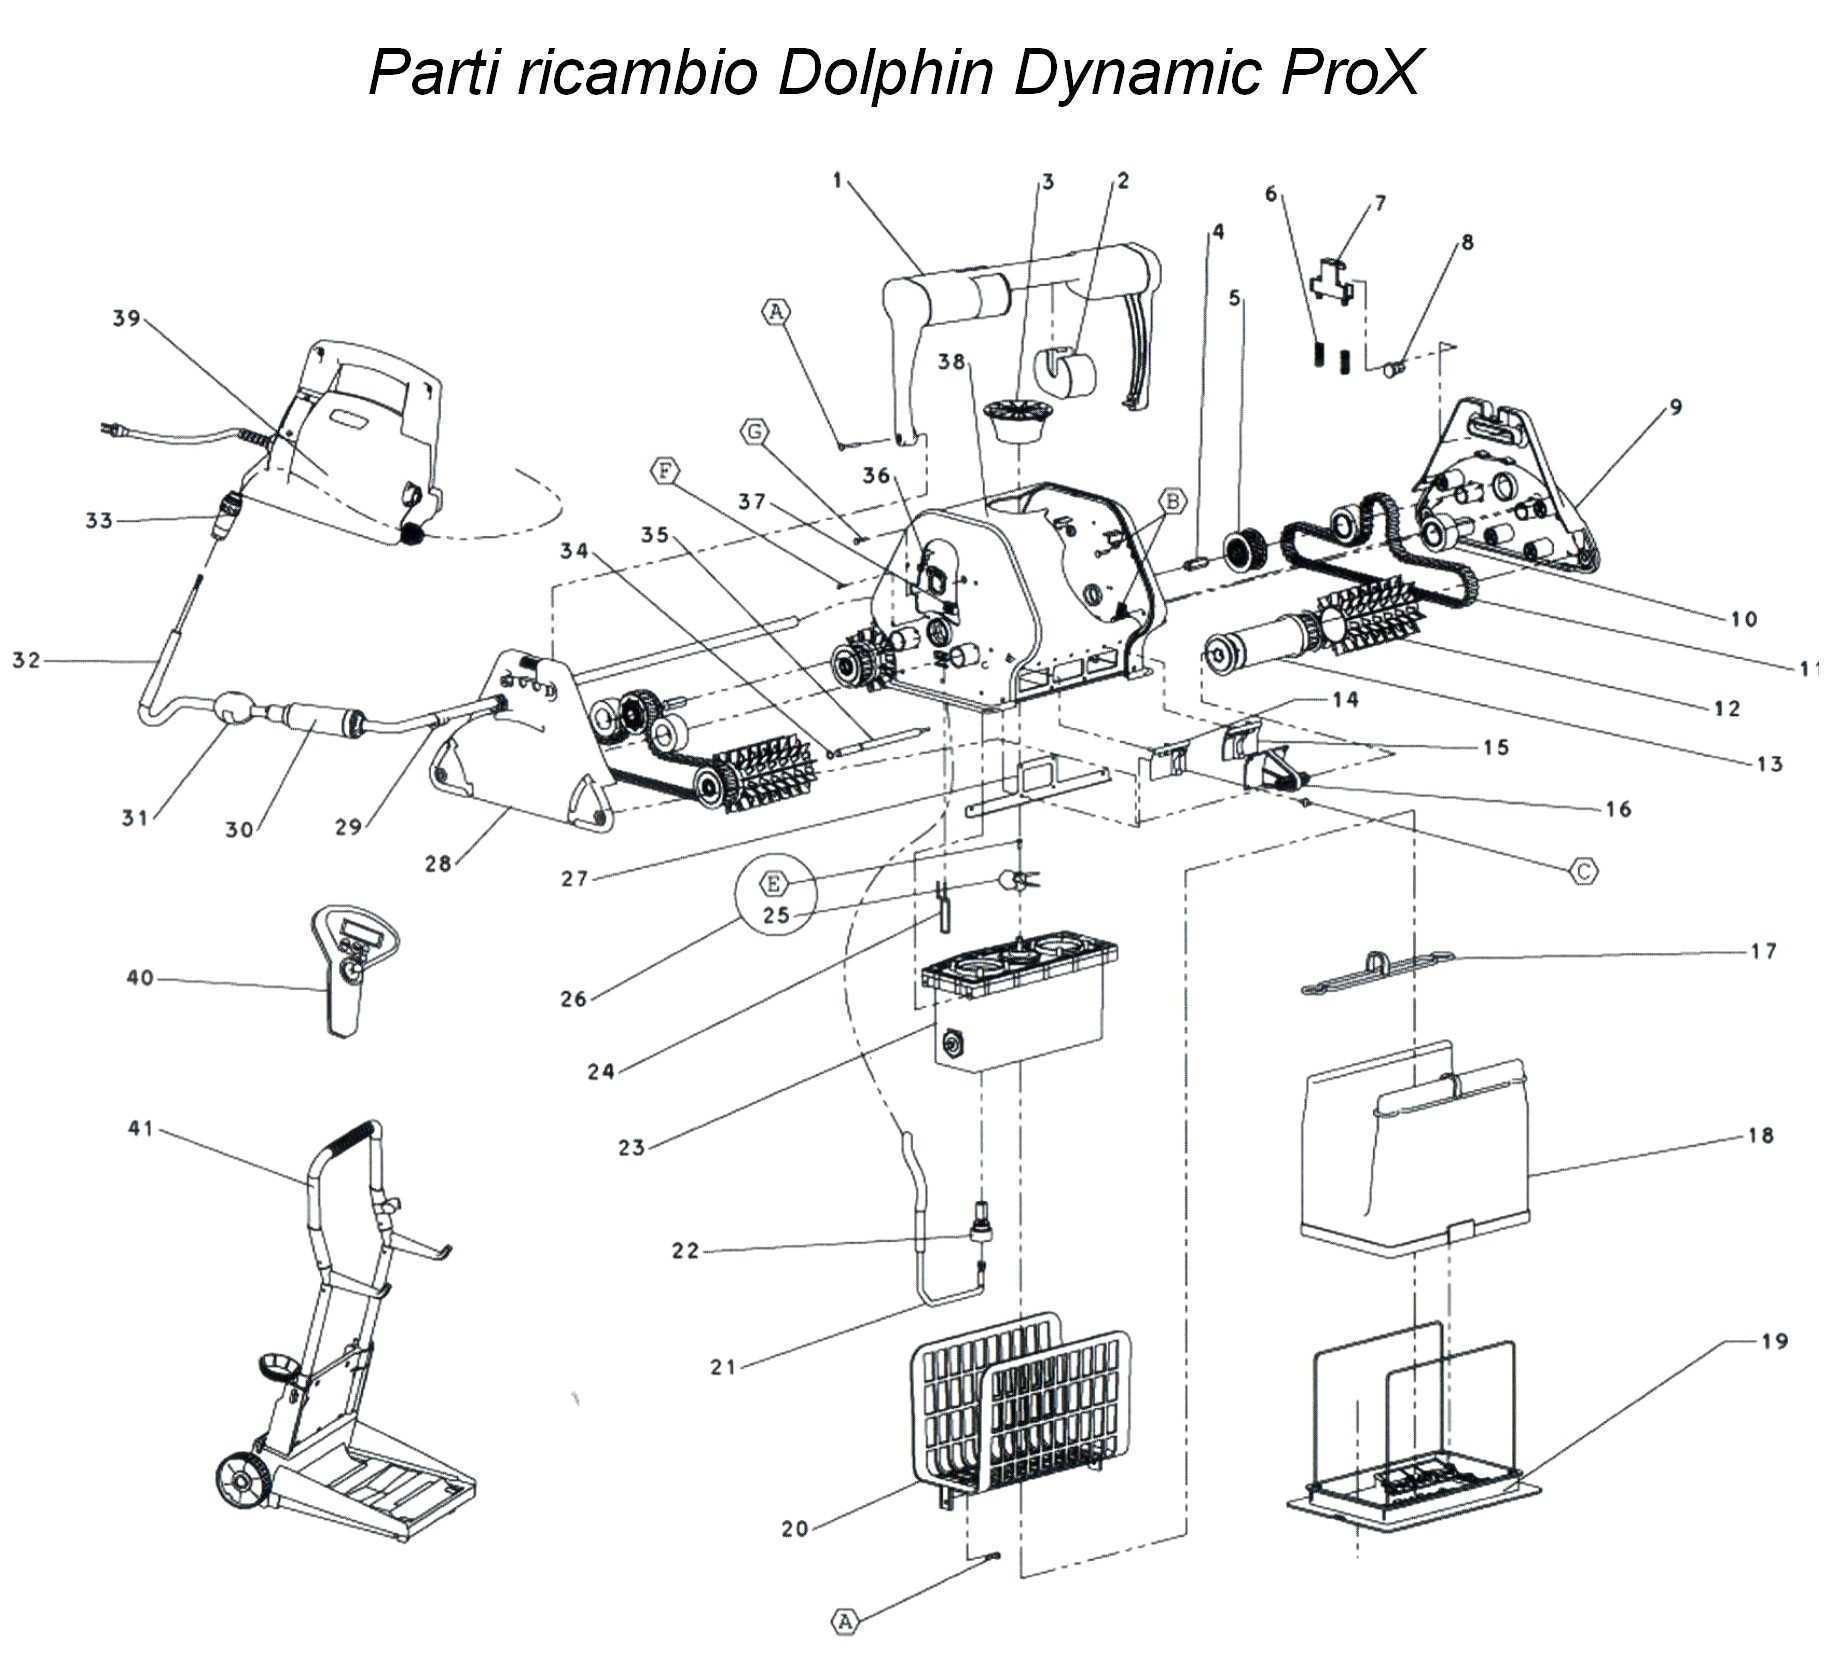 Hayward Electric Motor Wiring Diagram | Manual E-Books - Hayward Super Pump Wiring Diagram 115V